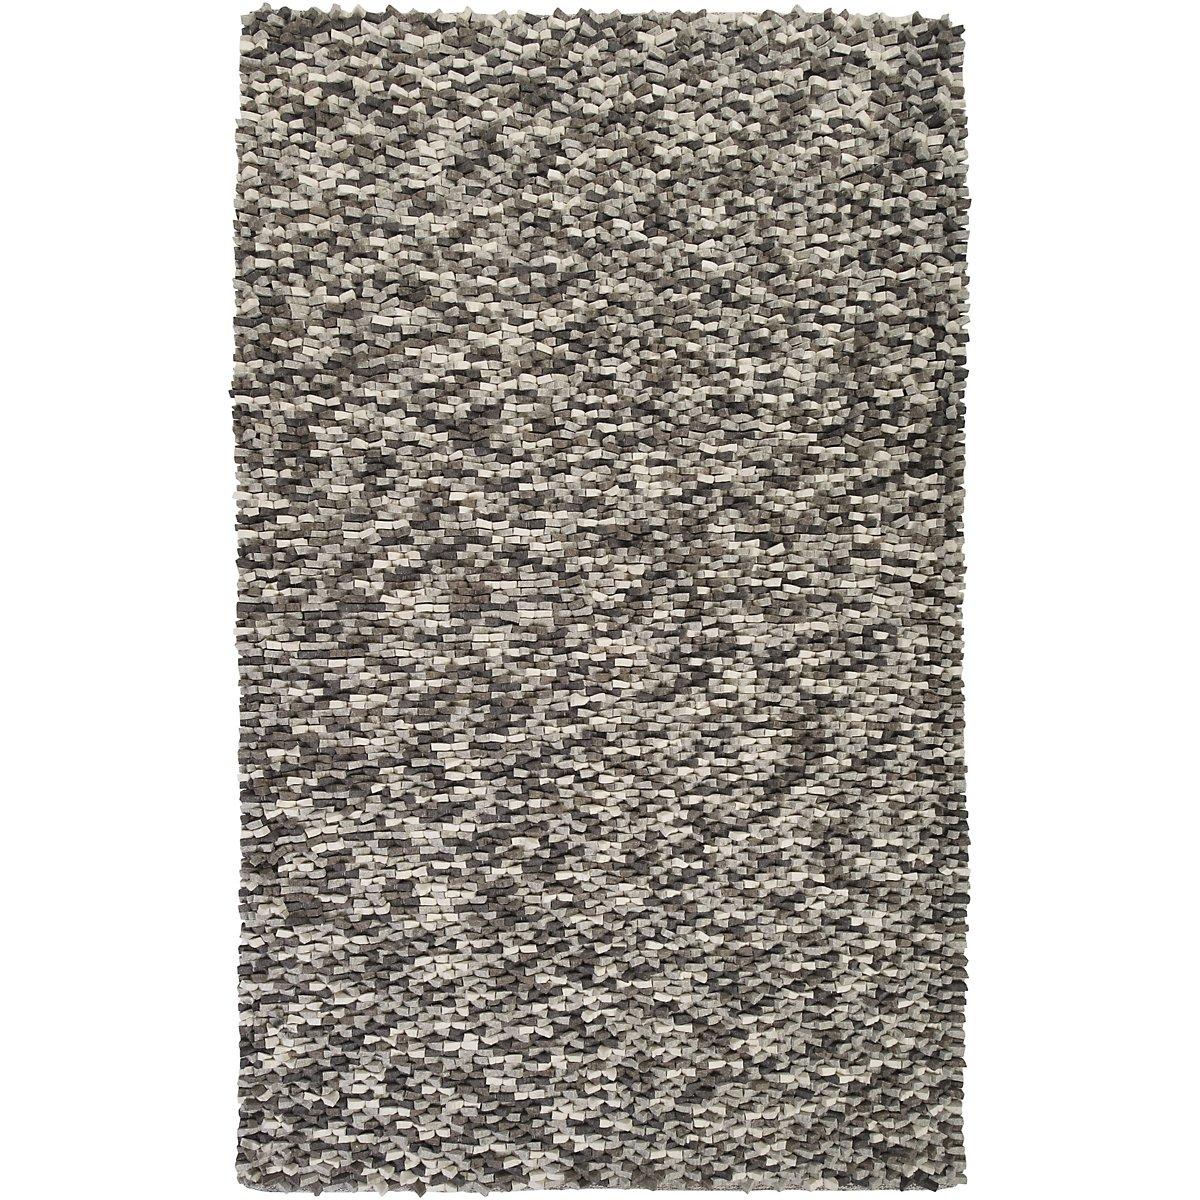 Stone Gray 8X10 Area Rug